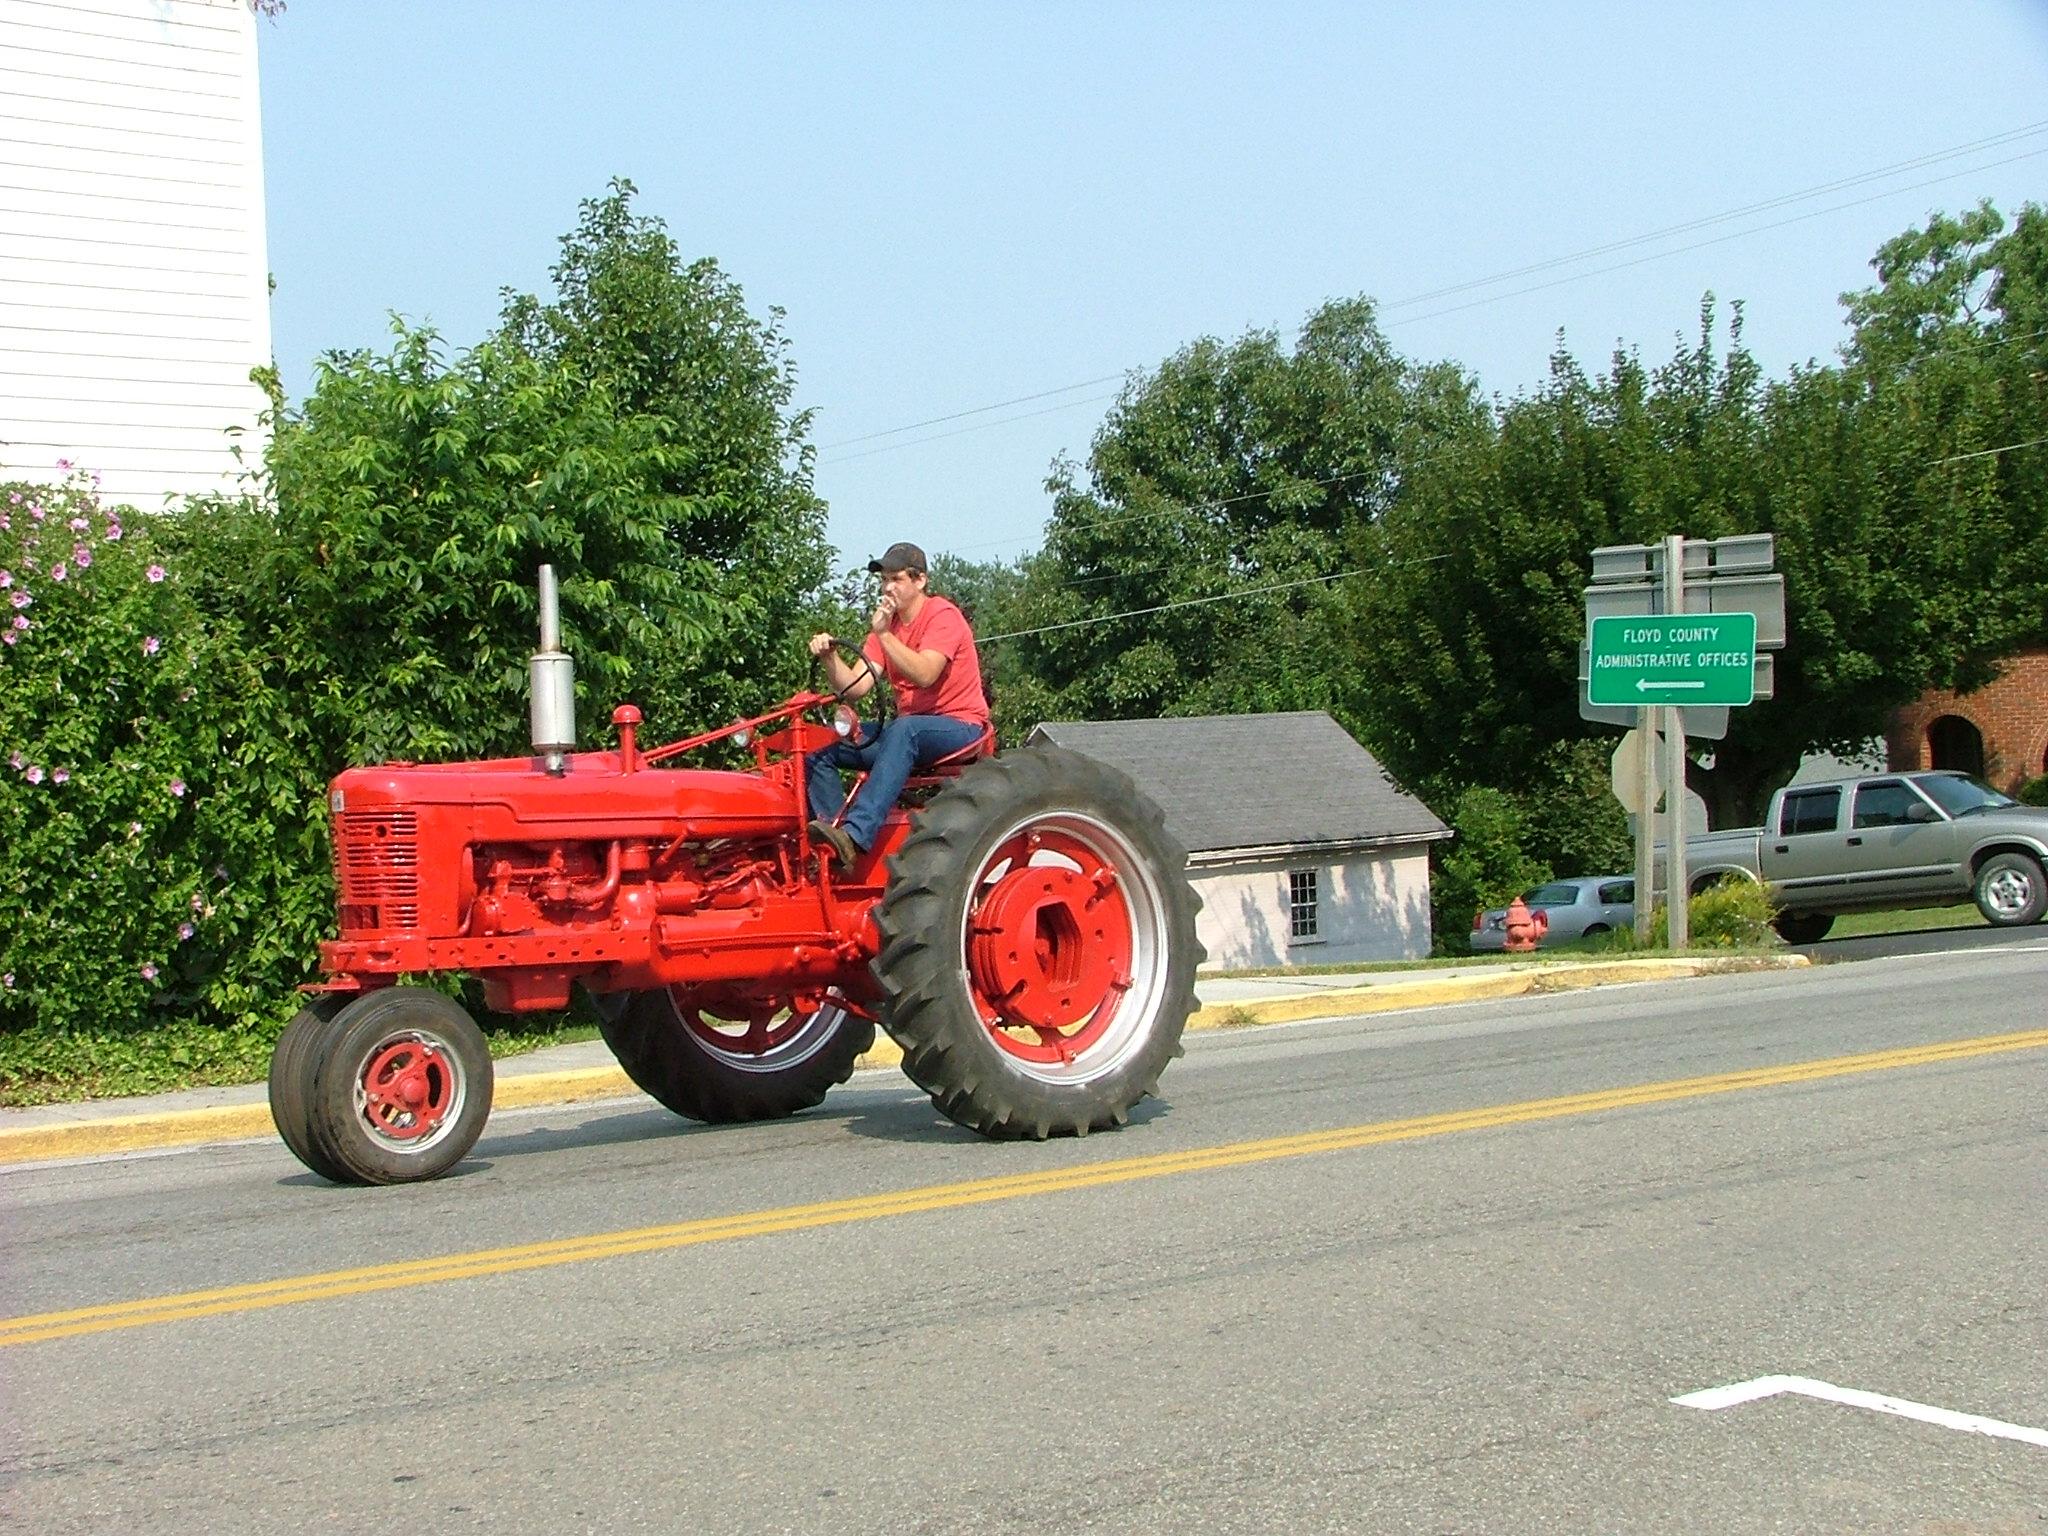 Tractor_Cruz-_August_18_07_031.jpg